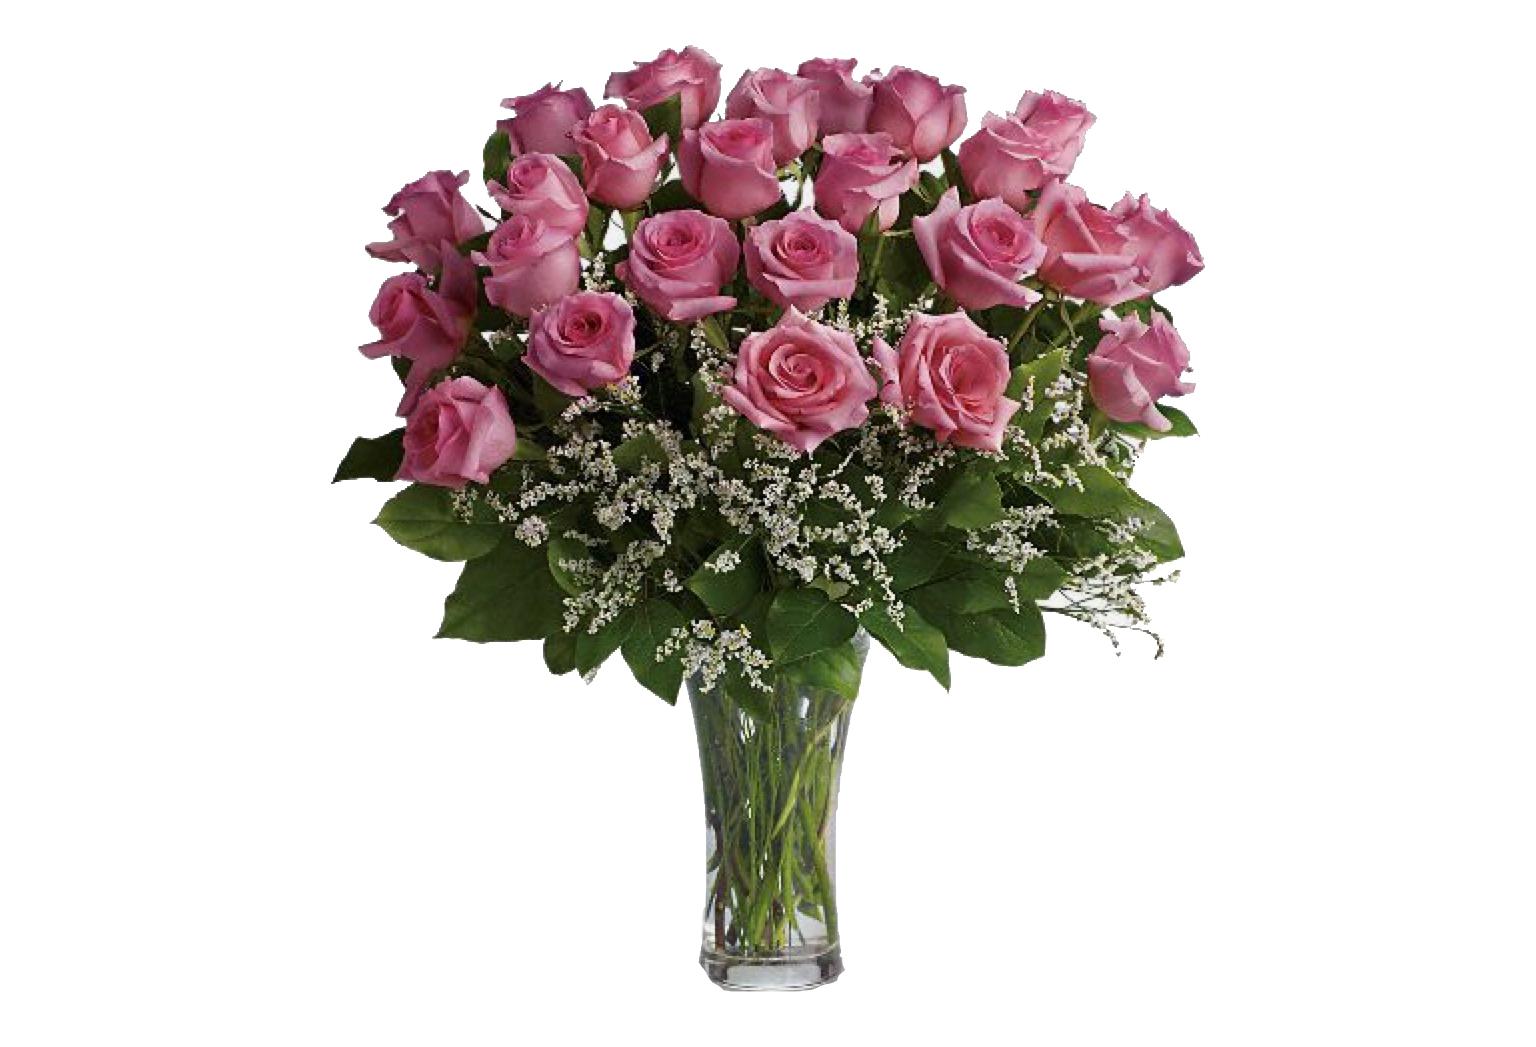 Flowers shop in dubai flower bouquets fresh flowers flower product image izmirmasajfo